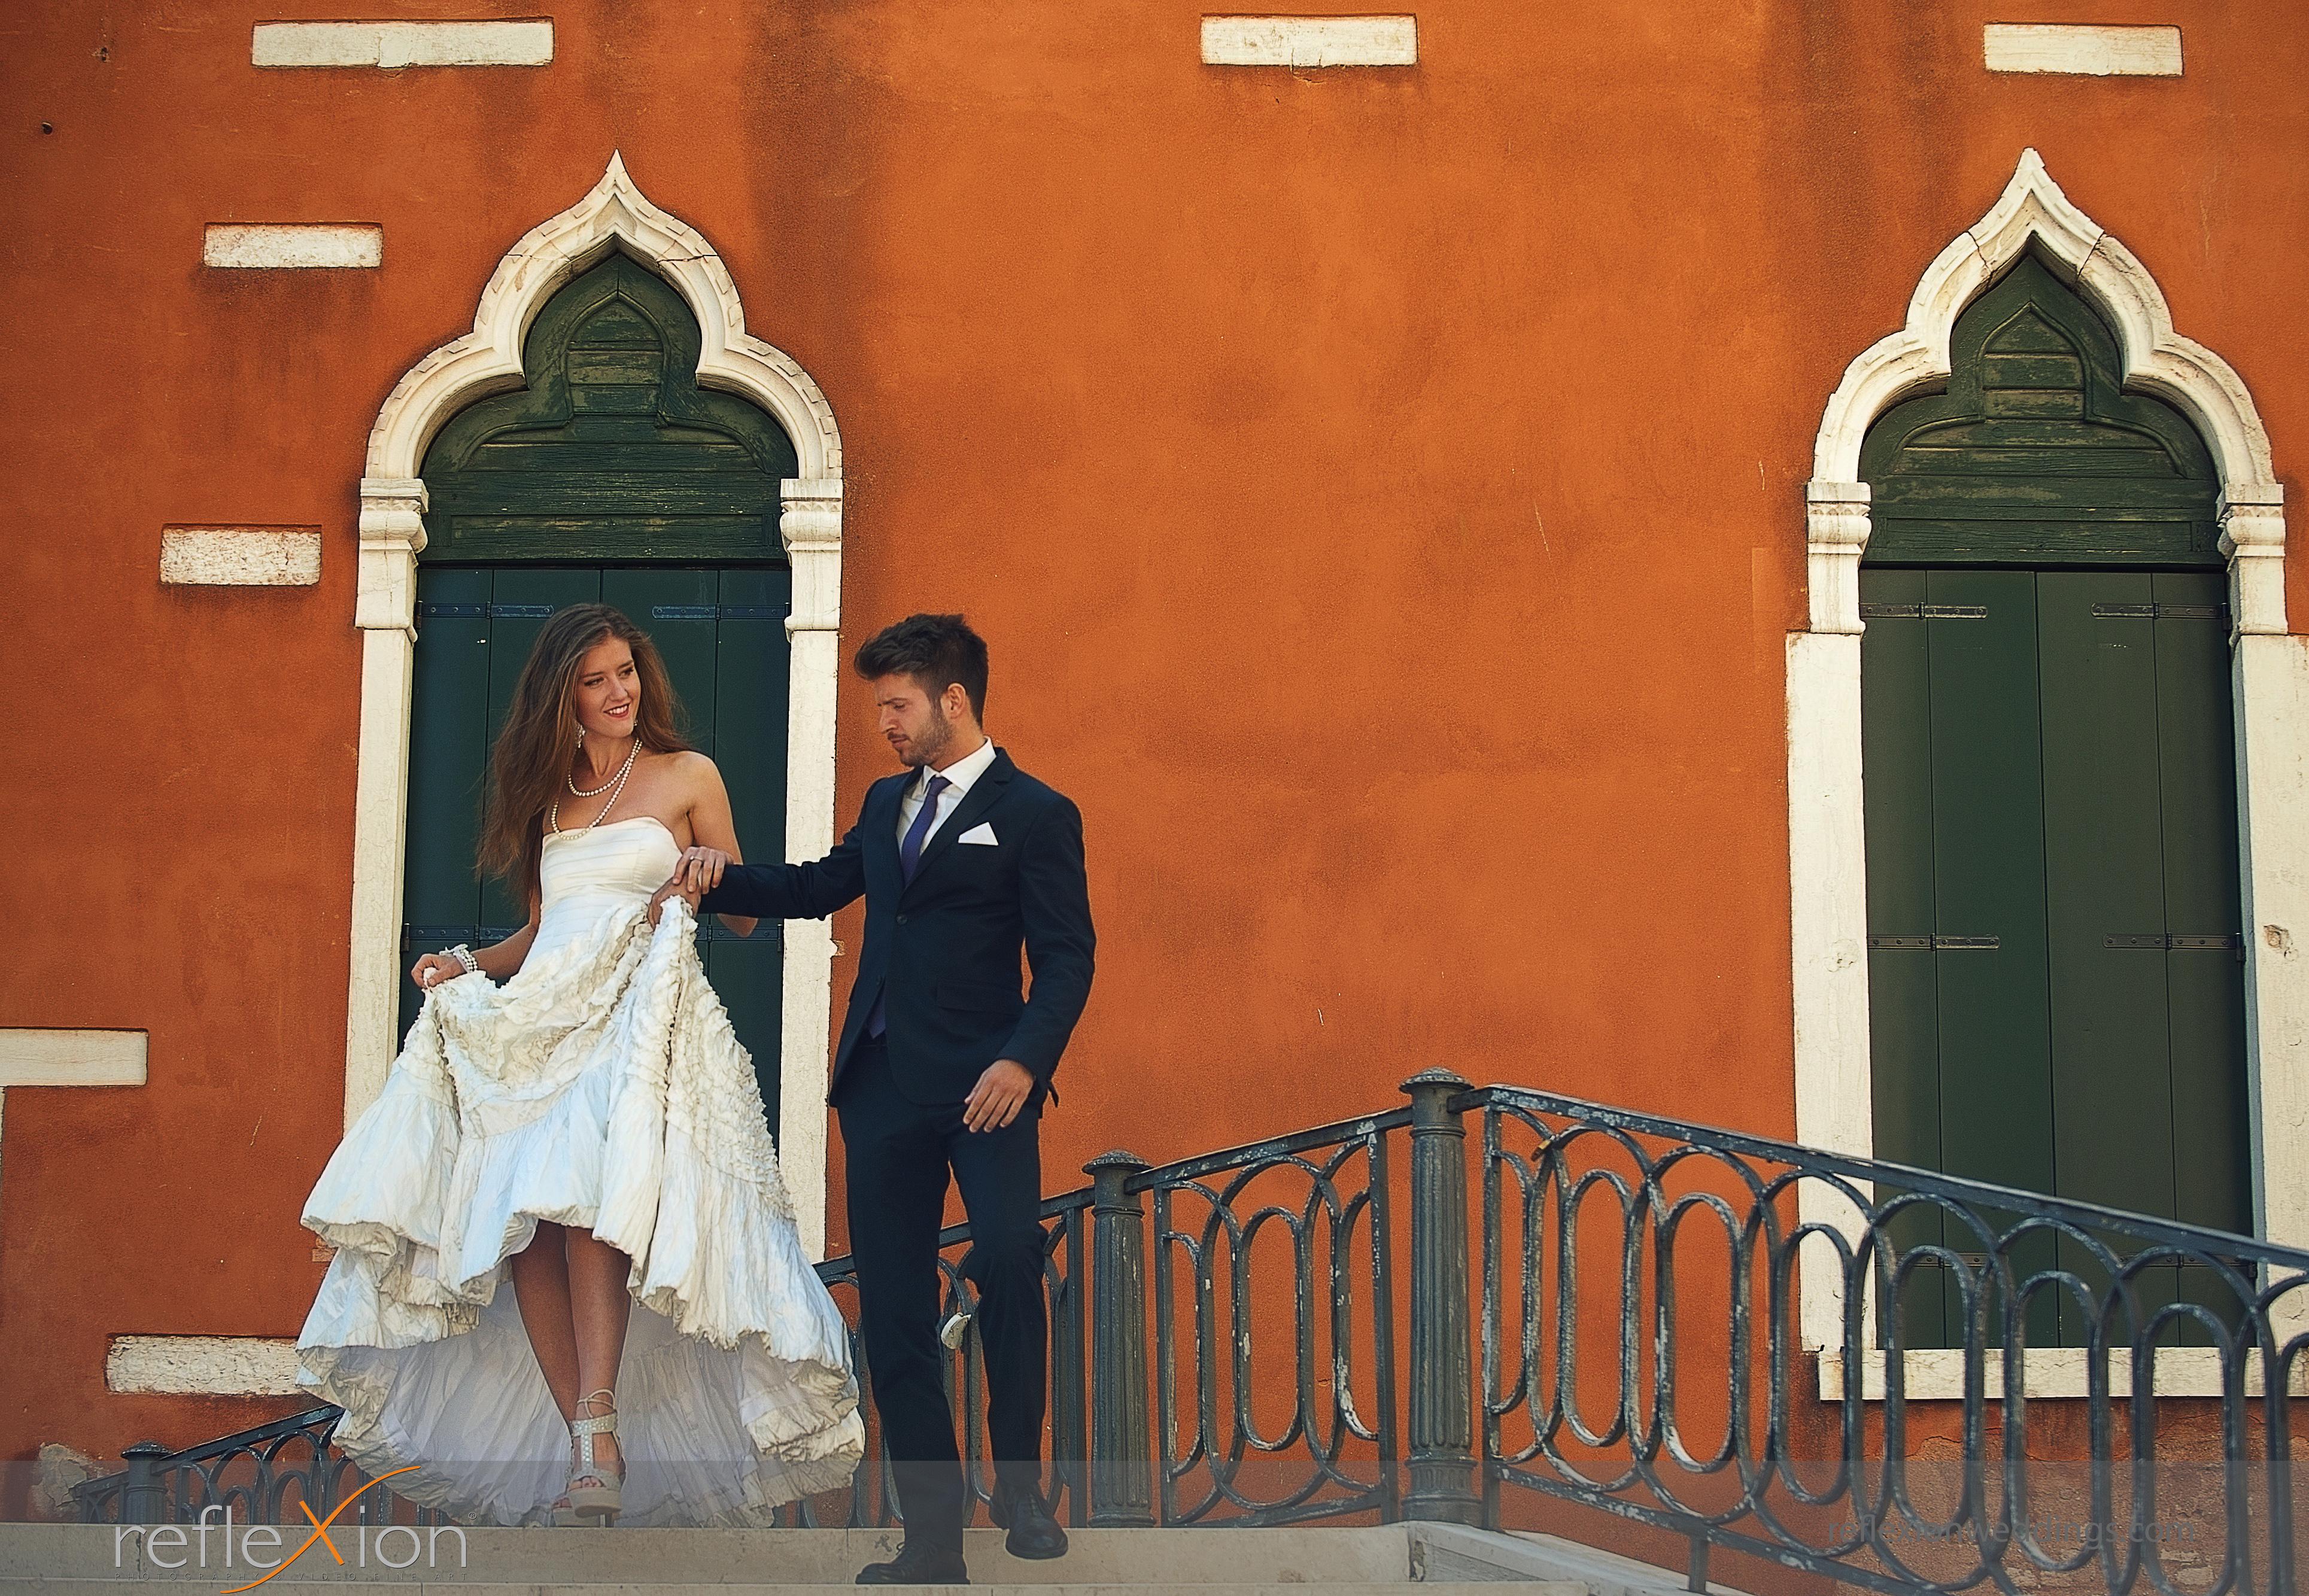 Locations for wedding photography in Venice - pontoone bridge